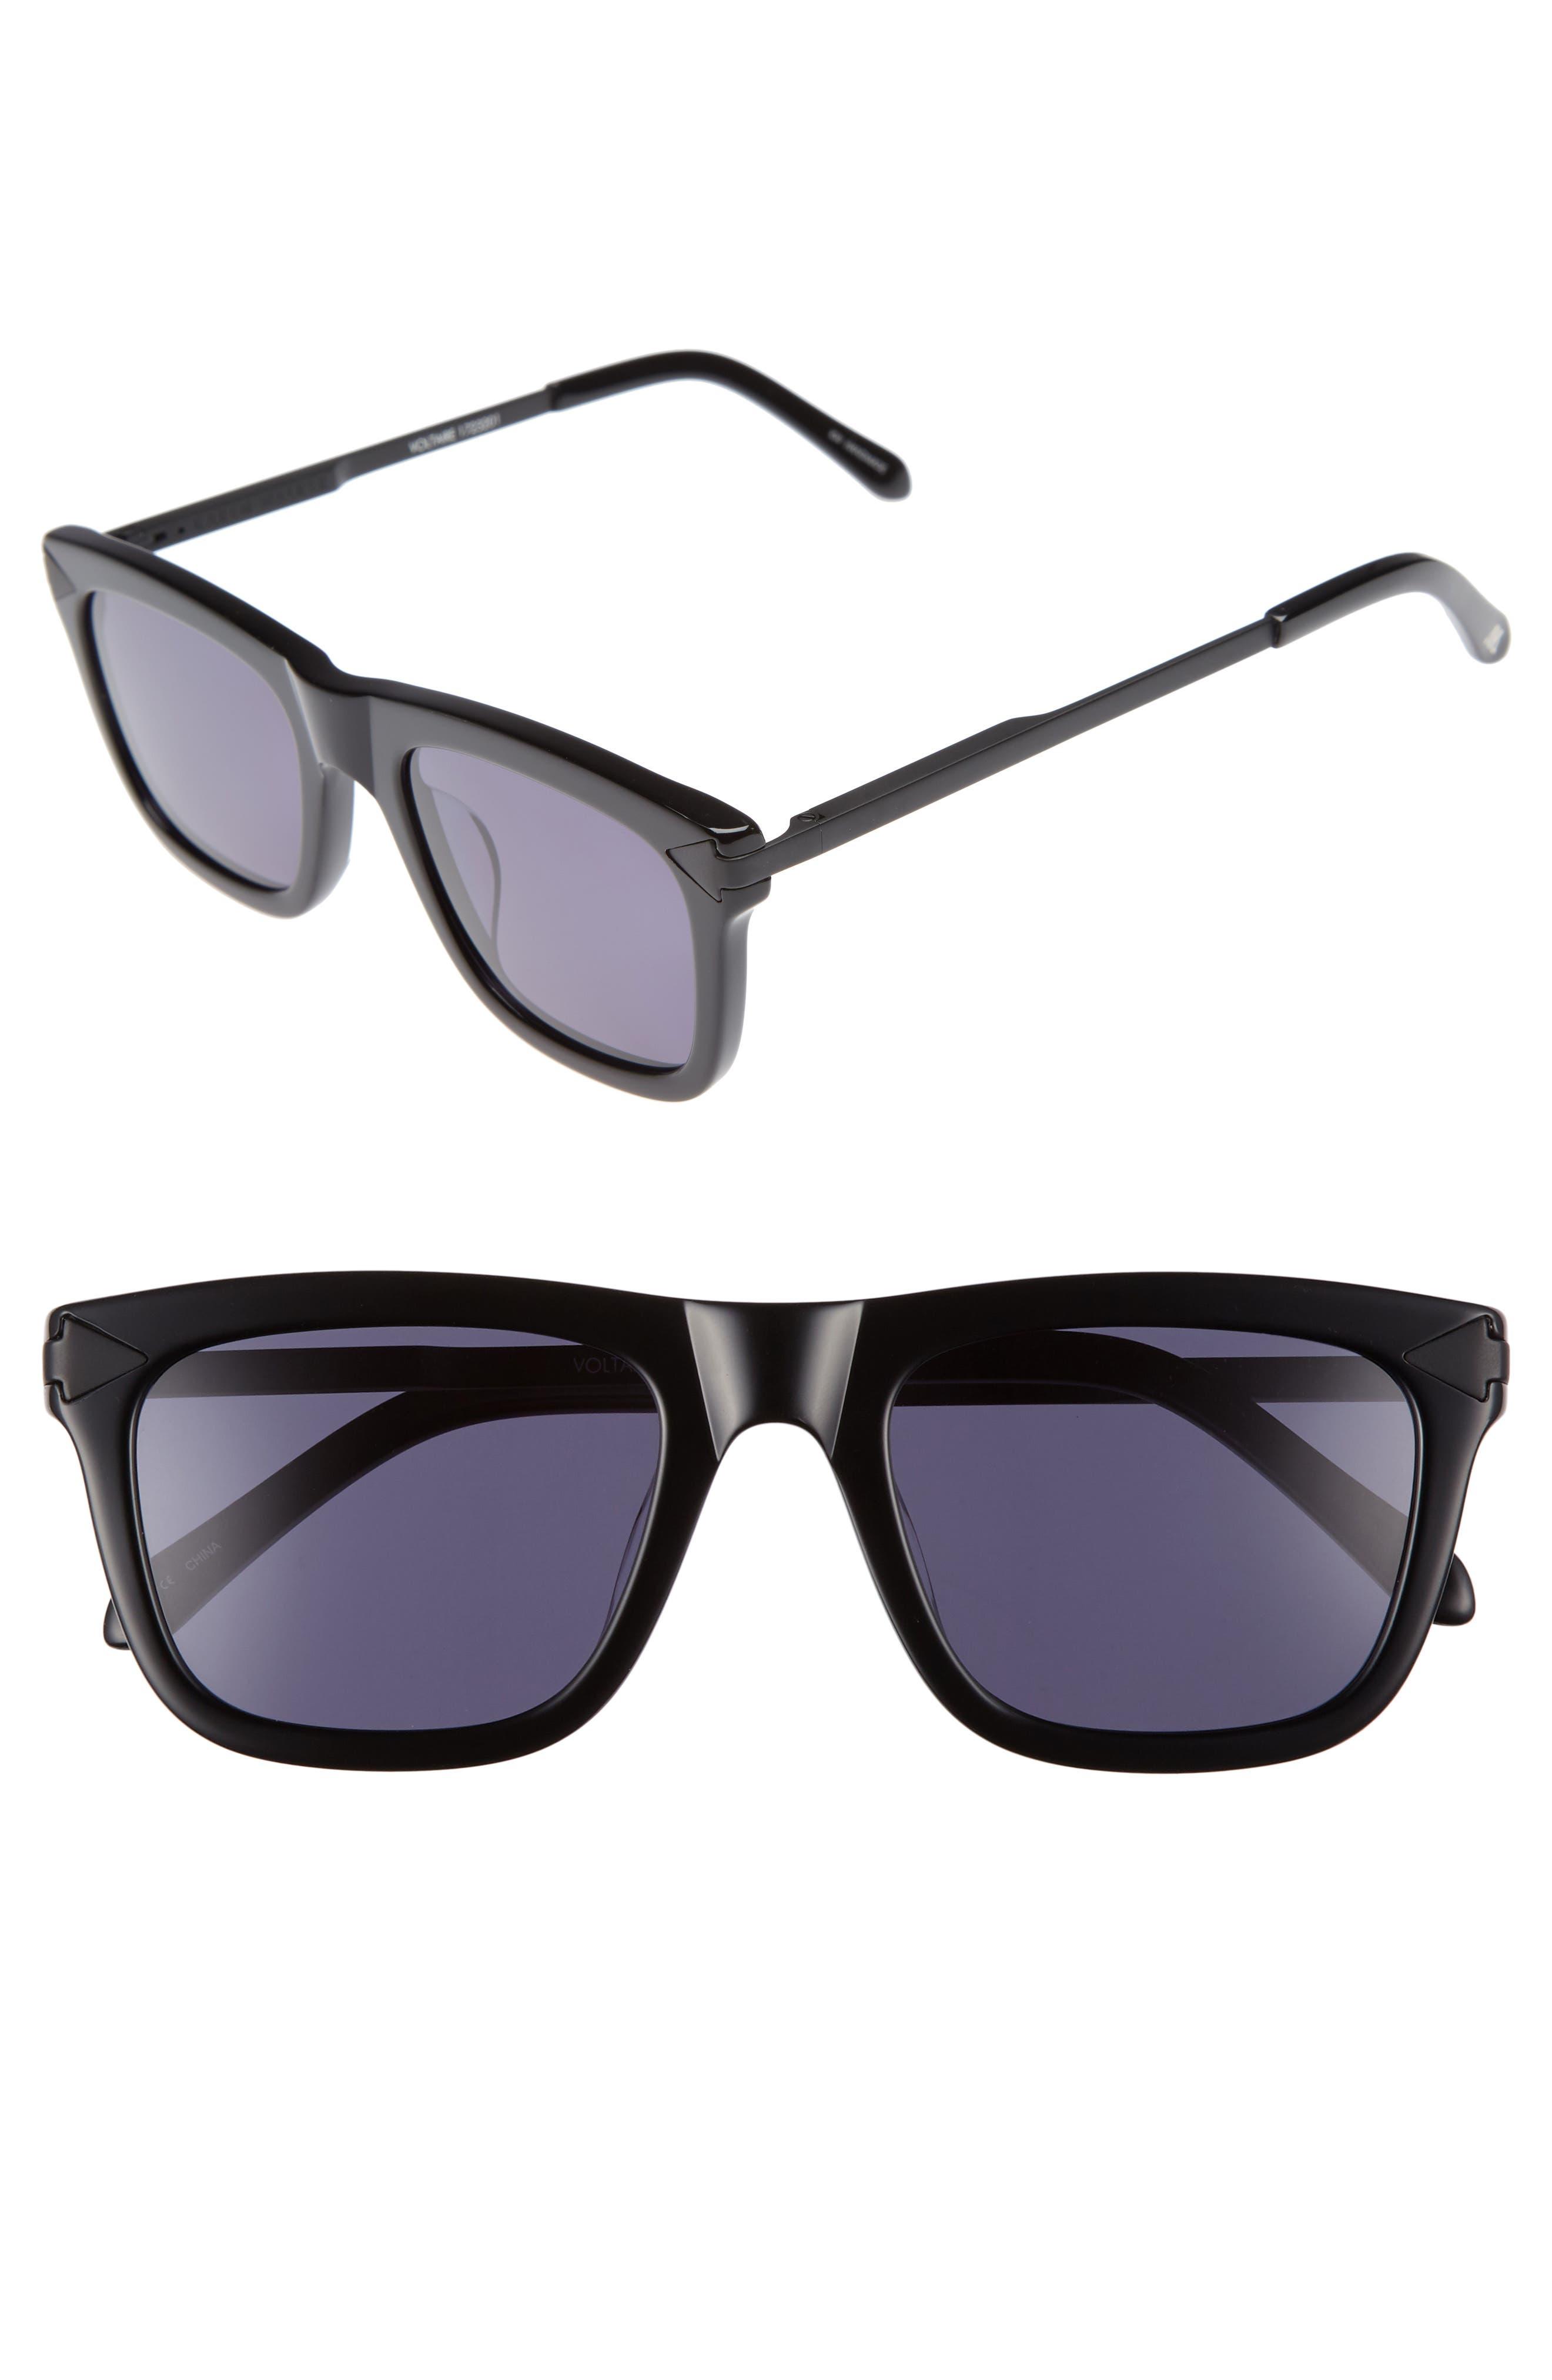 x Monumental Voltaire 51mm Polarized Sunglasses,                         Main,                         color, 001